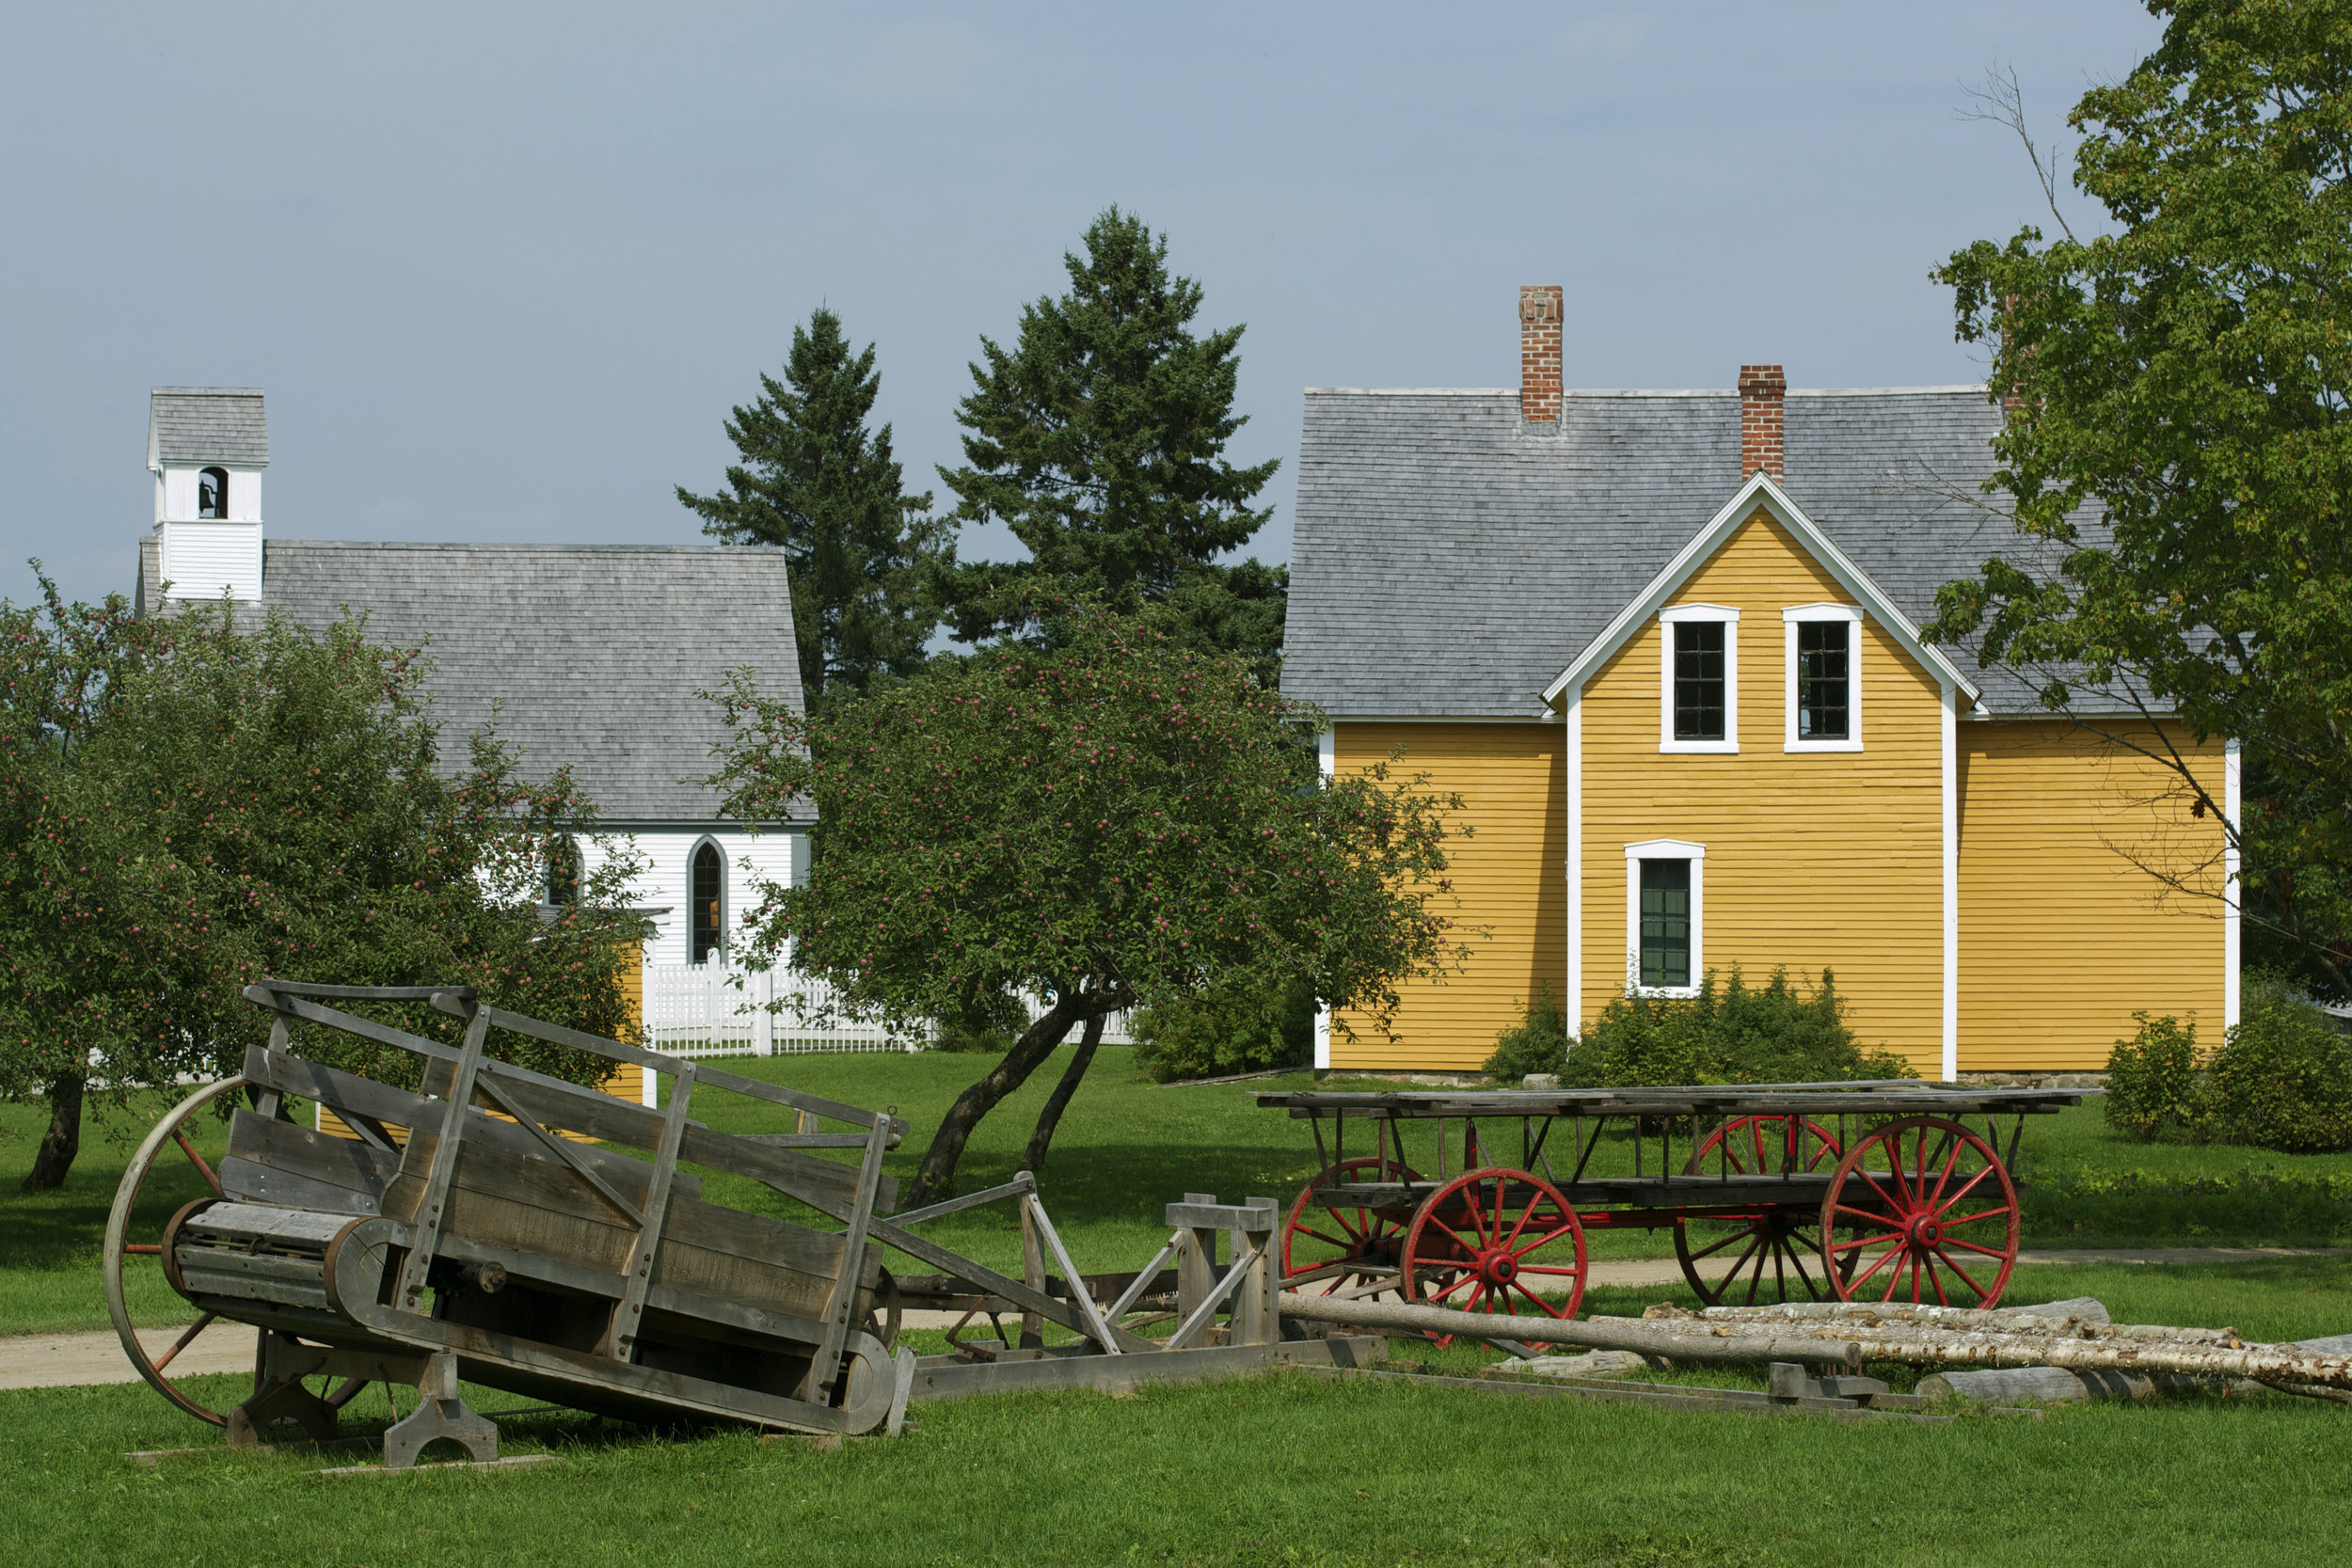 wagon-yellow-house-church-view.jpg